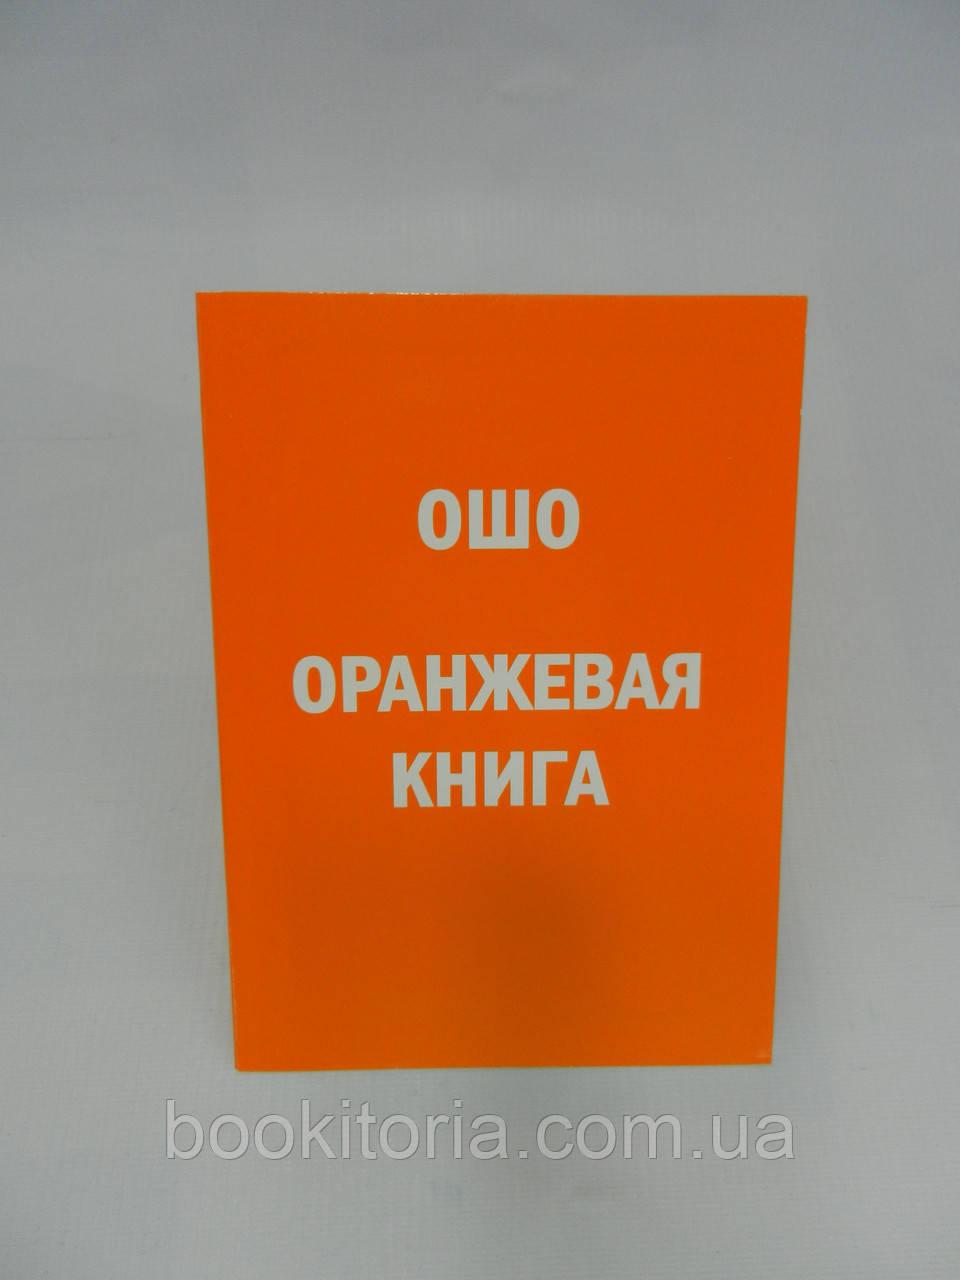 Ошо. Оранжевая книга (б/у).